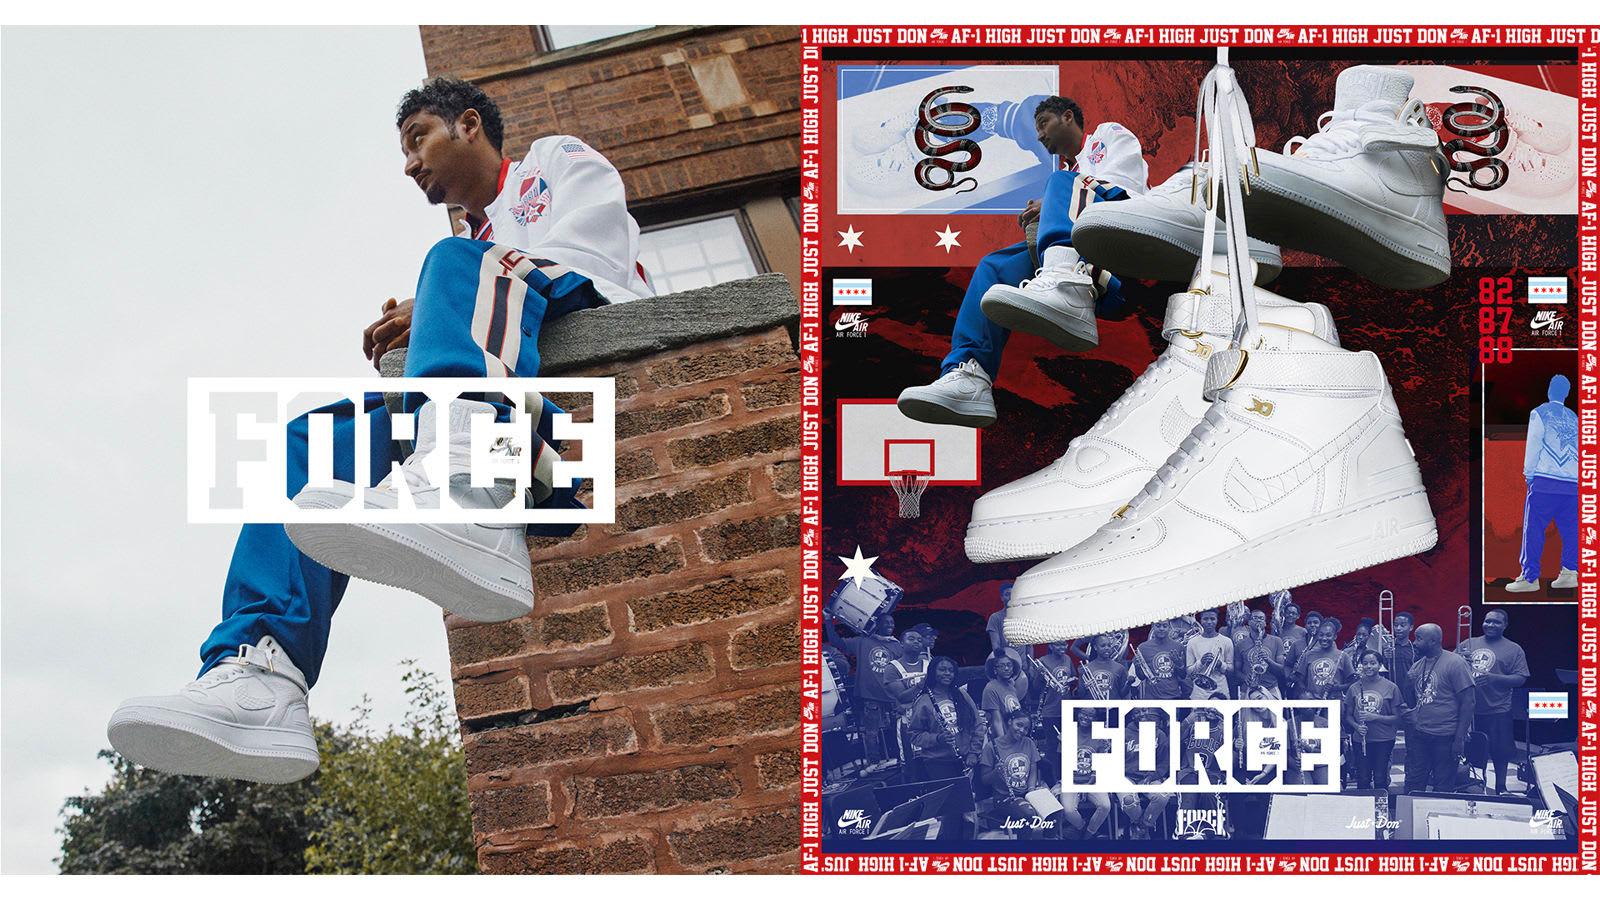 air force 1 celebration